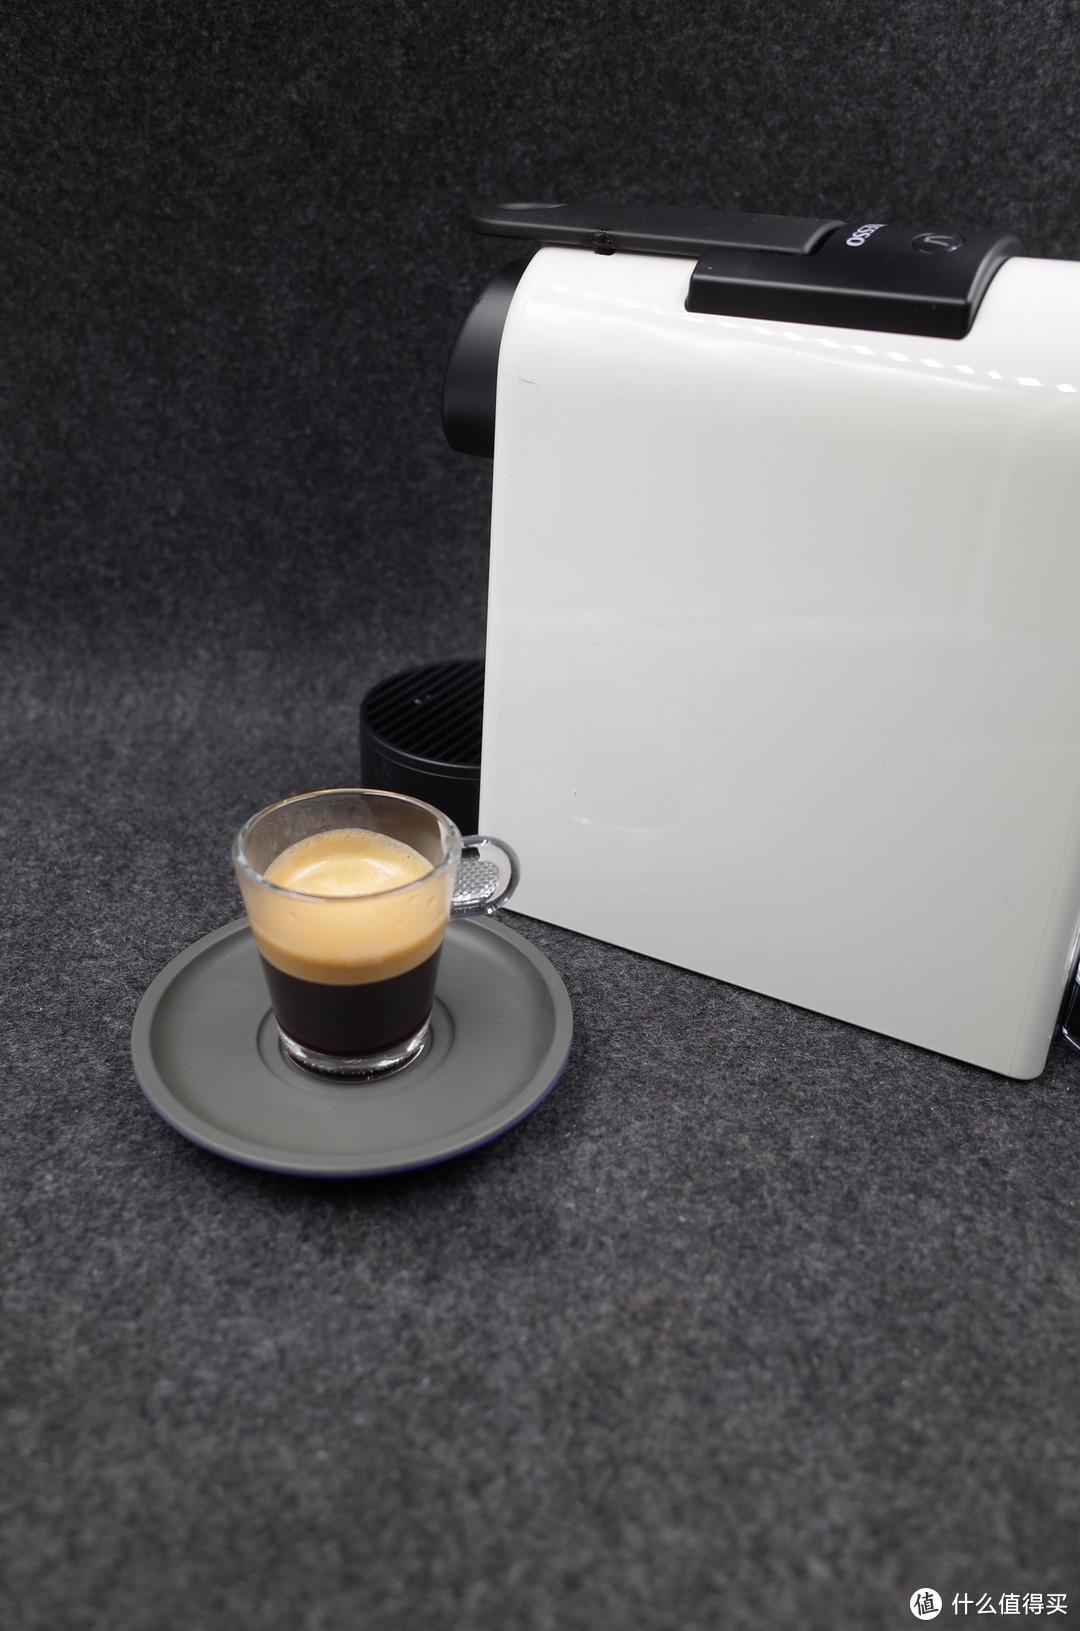 Nespresso 中文官网新会员套餐 胶囊 + 咖啡杯碟套装 开箱